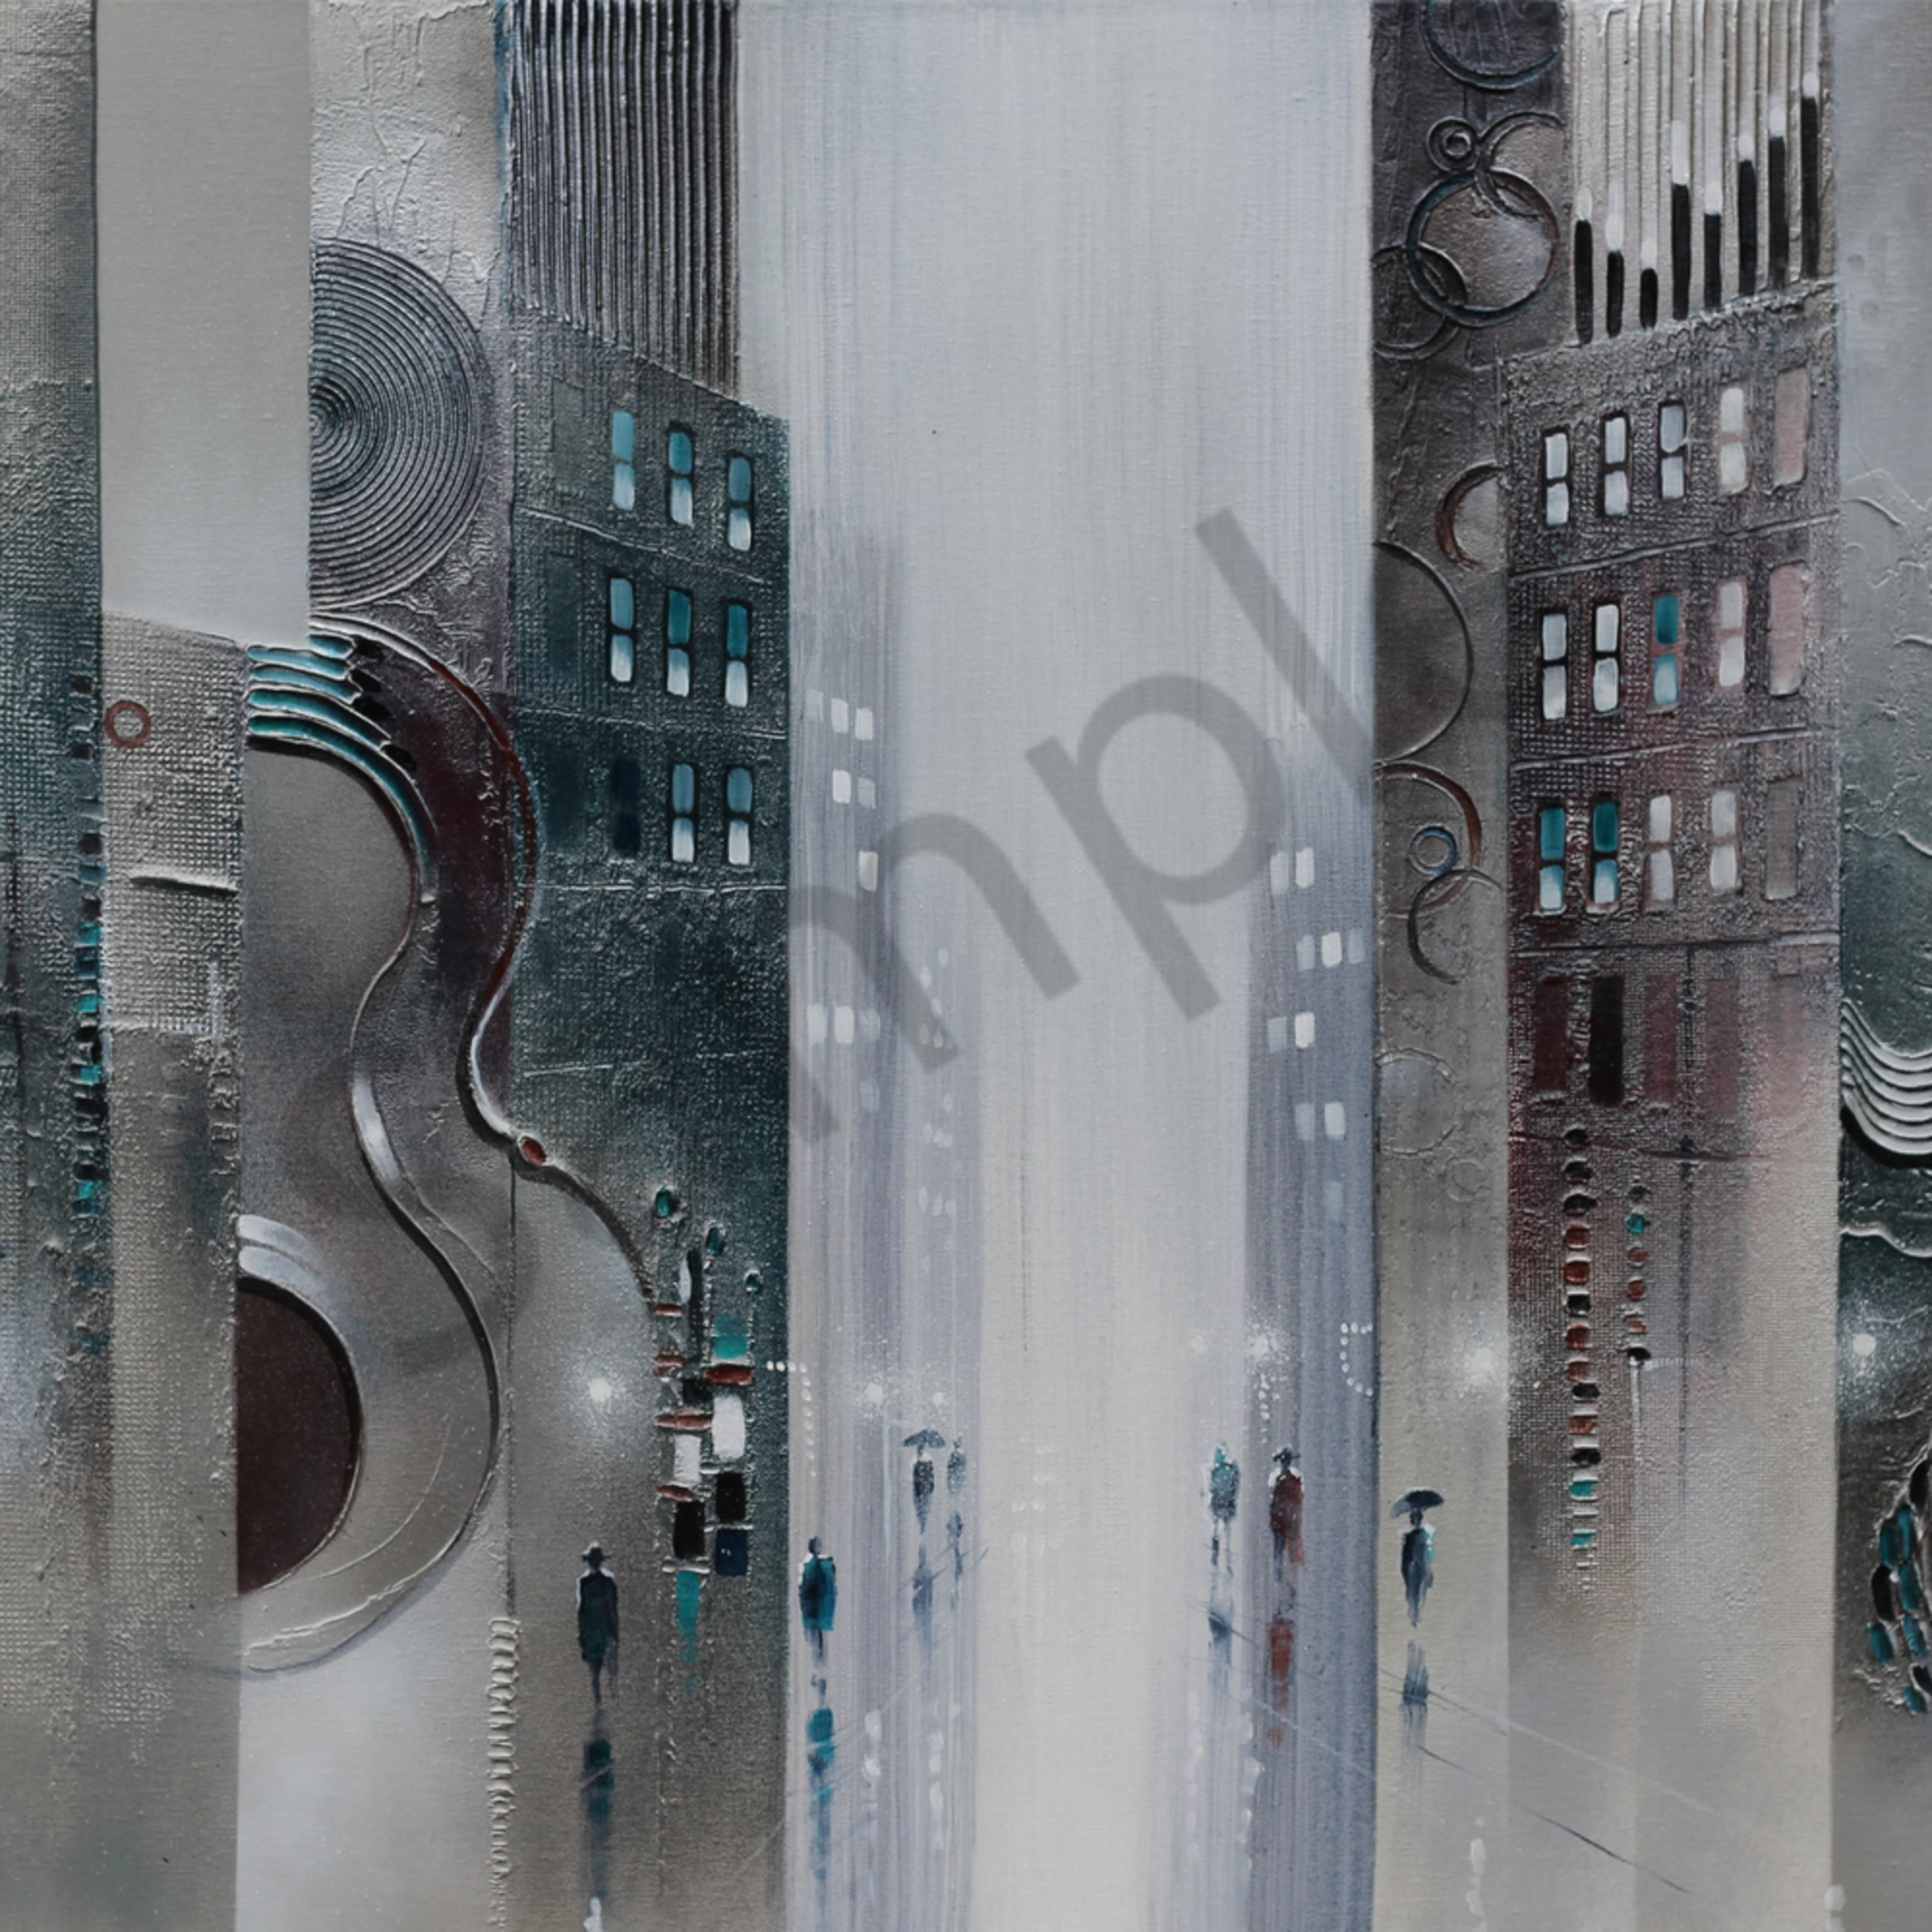 Sounds of the city 1 of 1 e7ewgq